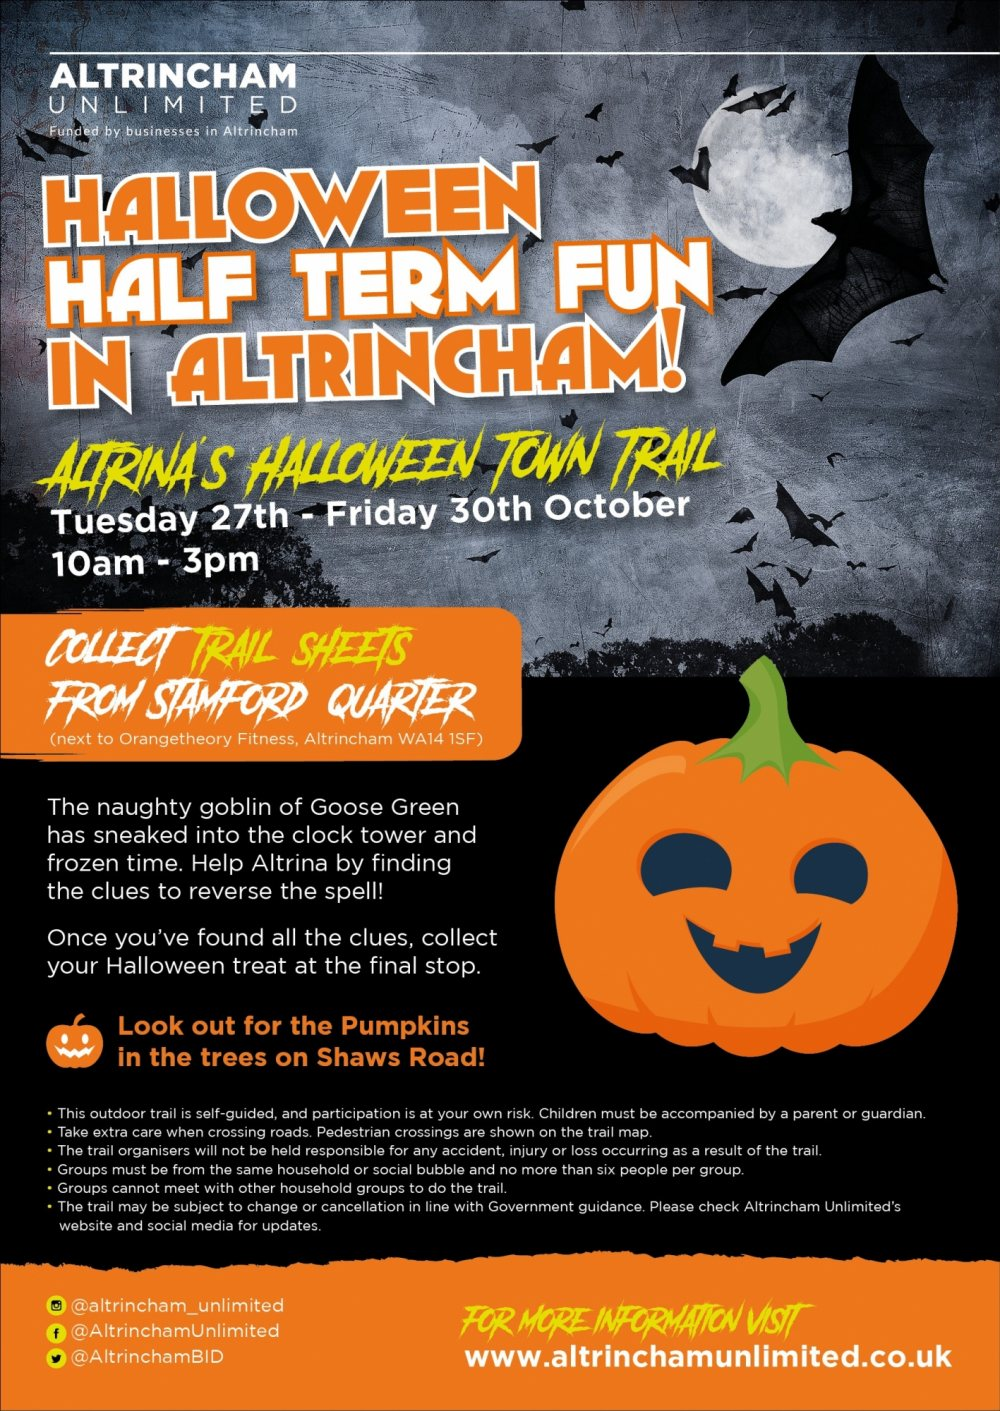 Halloween Fun in Altrincham